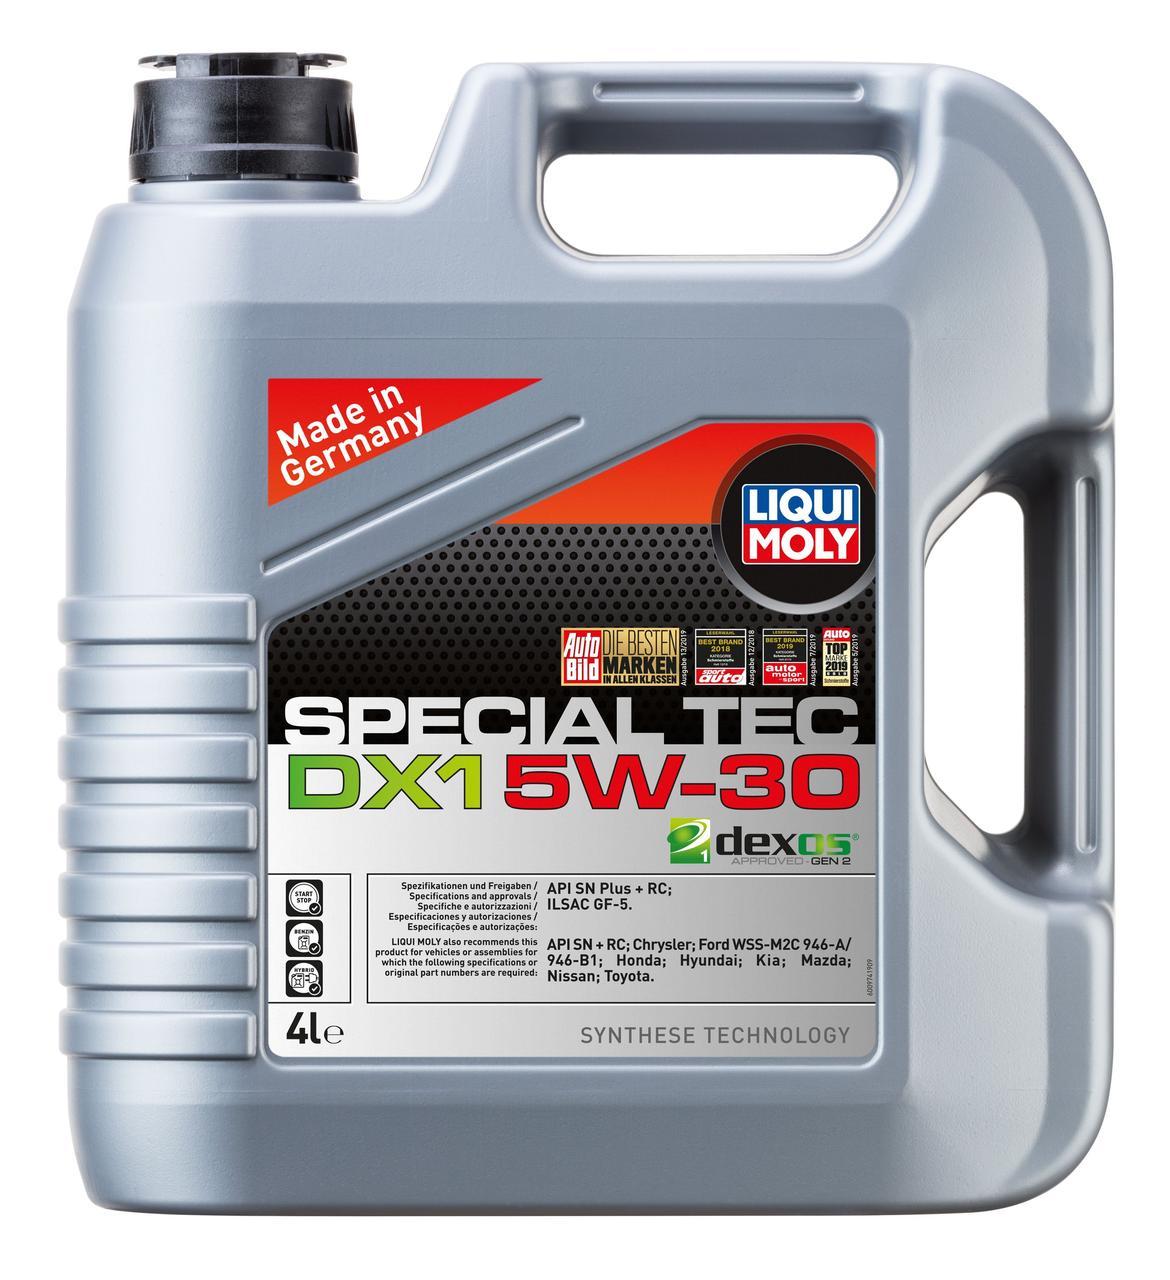 Синтетичне моторне масло Liqui Moly Special Tec DX1 5W-30